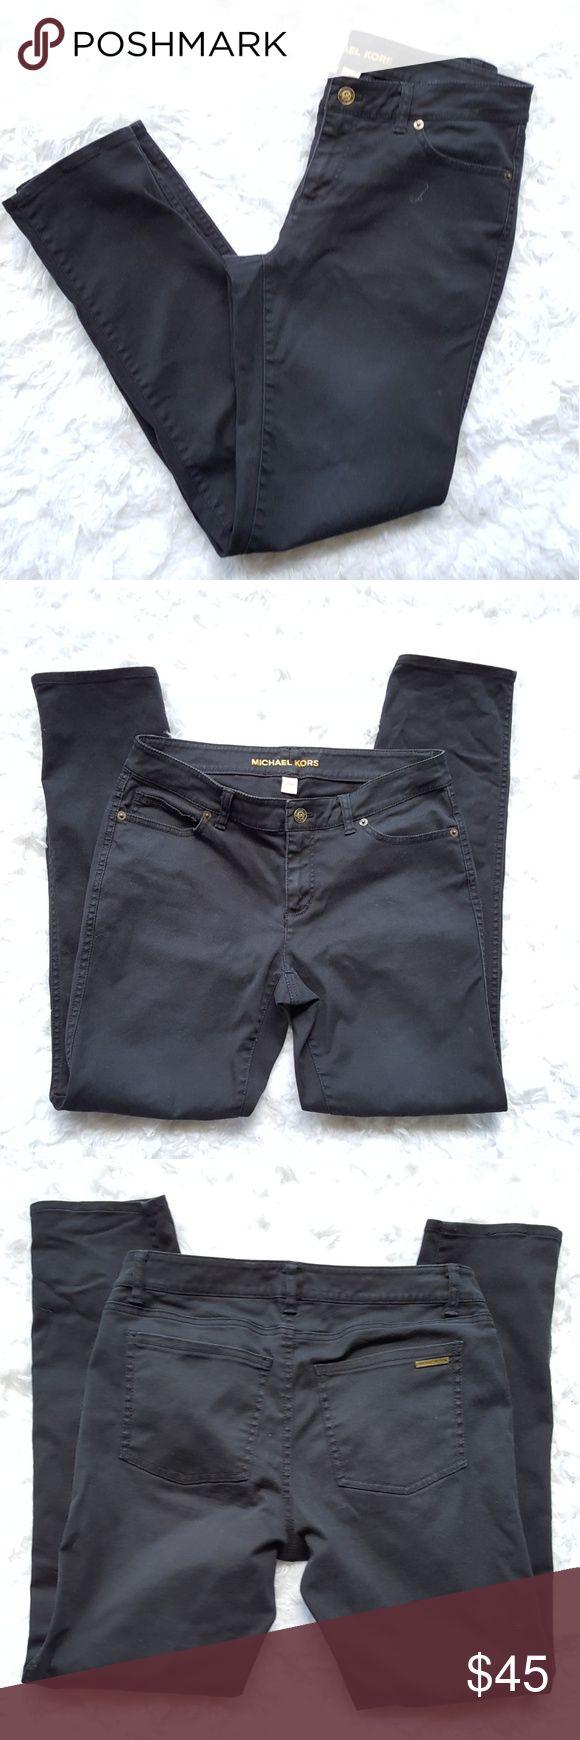 Michael Kors Black Jeans Michael Kors size 2 black jeans. Does have a small bit of Satan. No holes or tears. Michael Kors Jeans